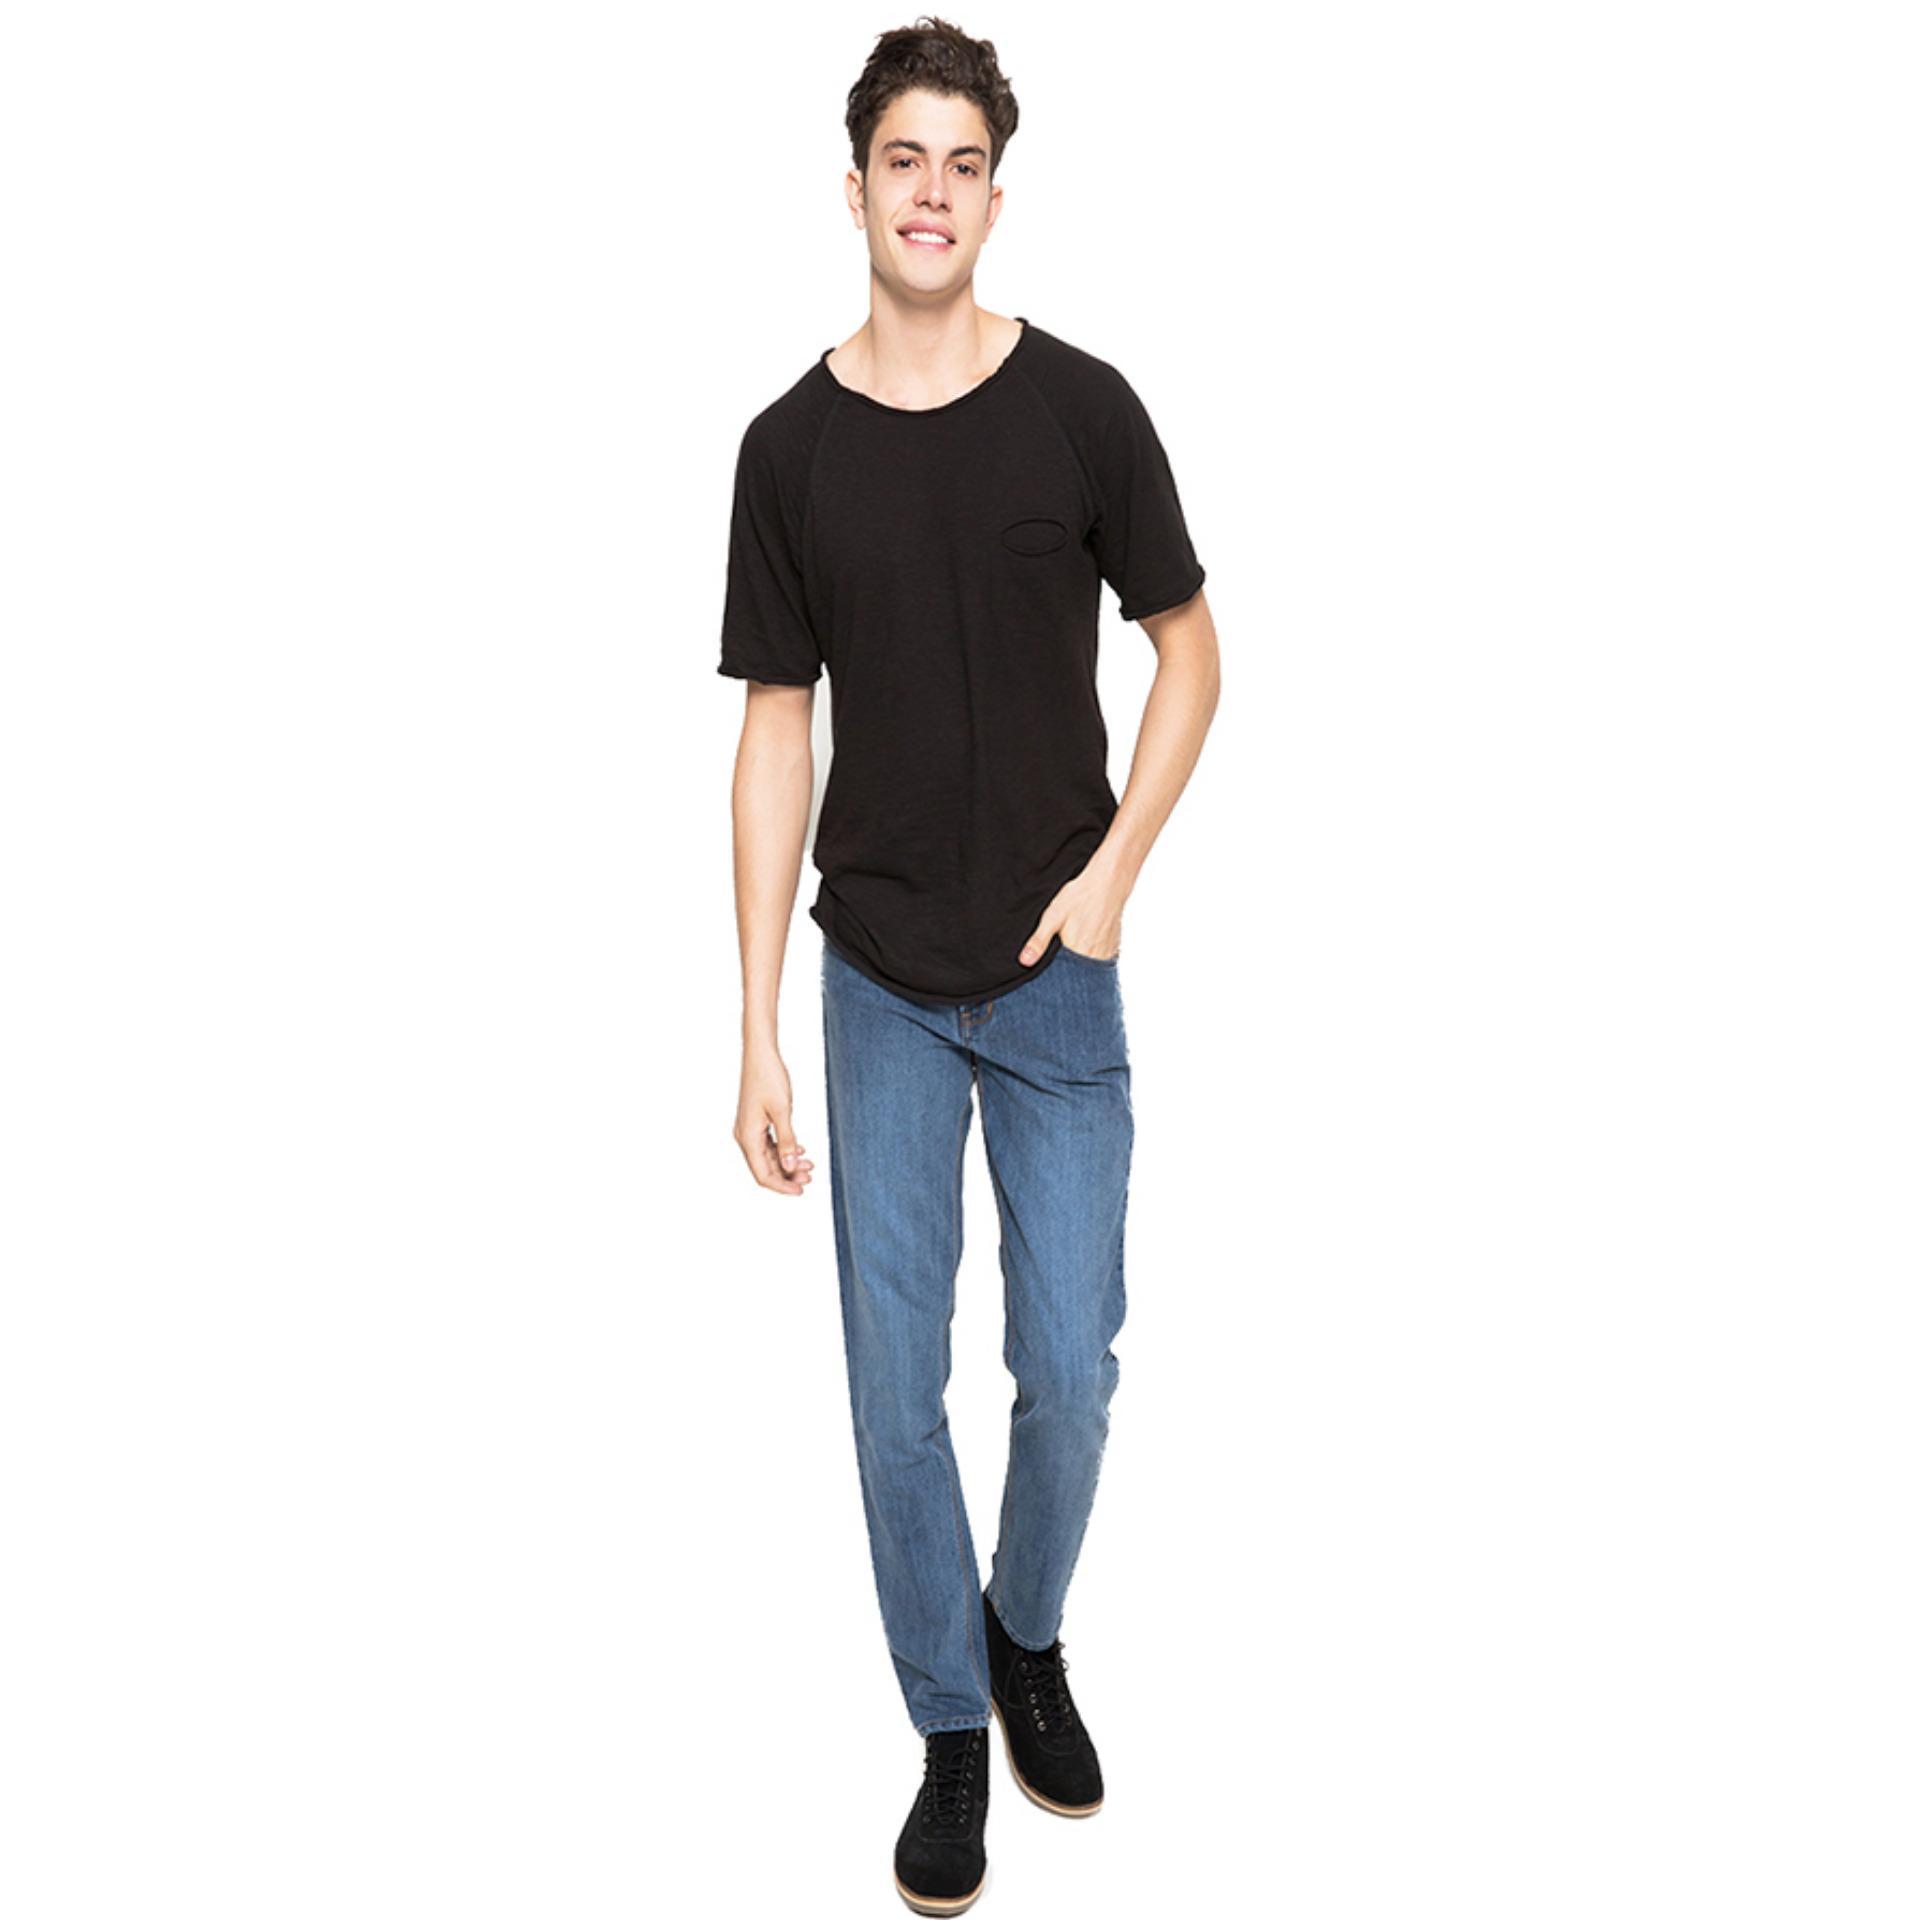 ... 2nd Red Celana Jeans Slim Fit Premium Full Spray Biru 133216 - 4 ...